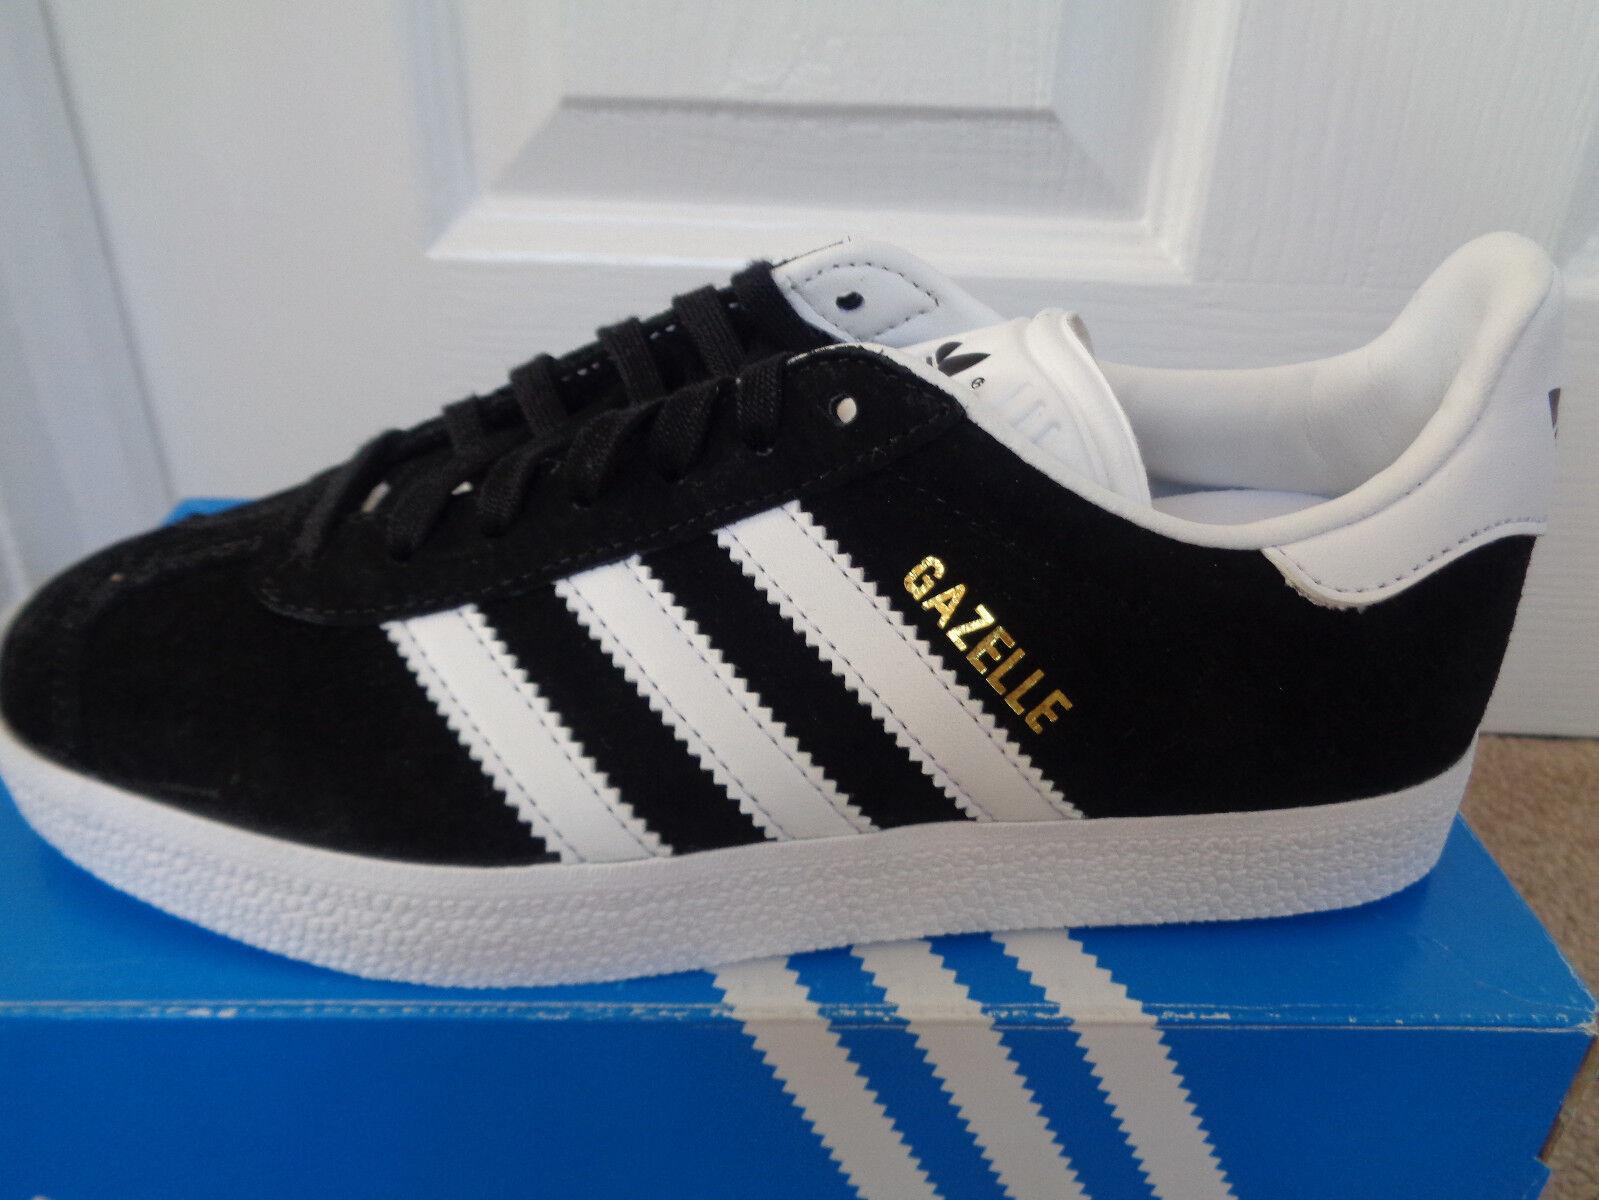 Adidas Gazelle mens sneakers trainers shoes BB5476 eu 36 2 3 us 4.5 NEW+BOX